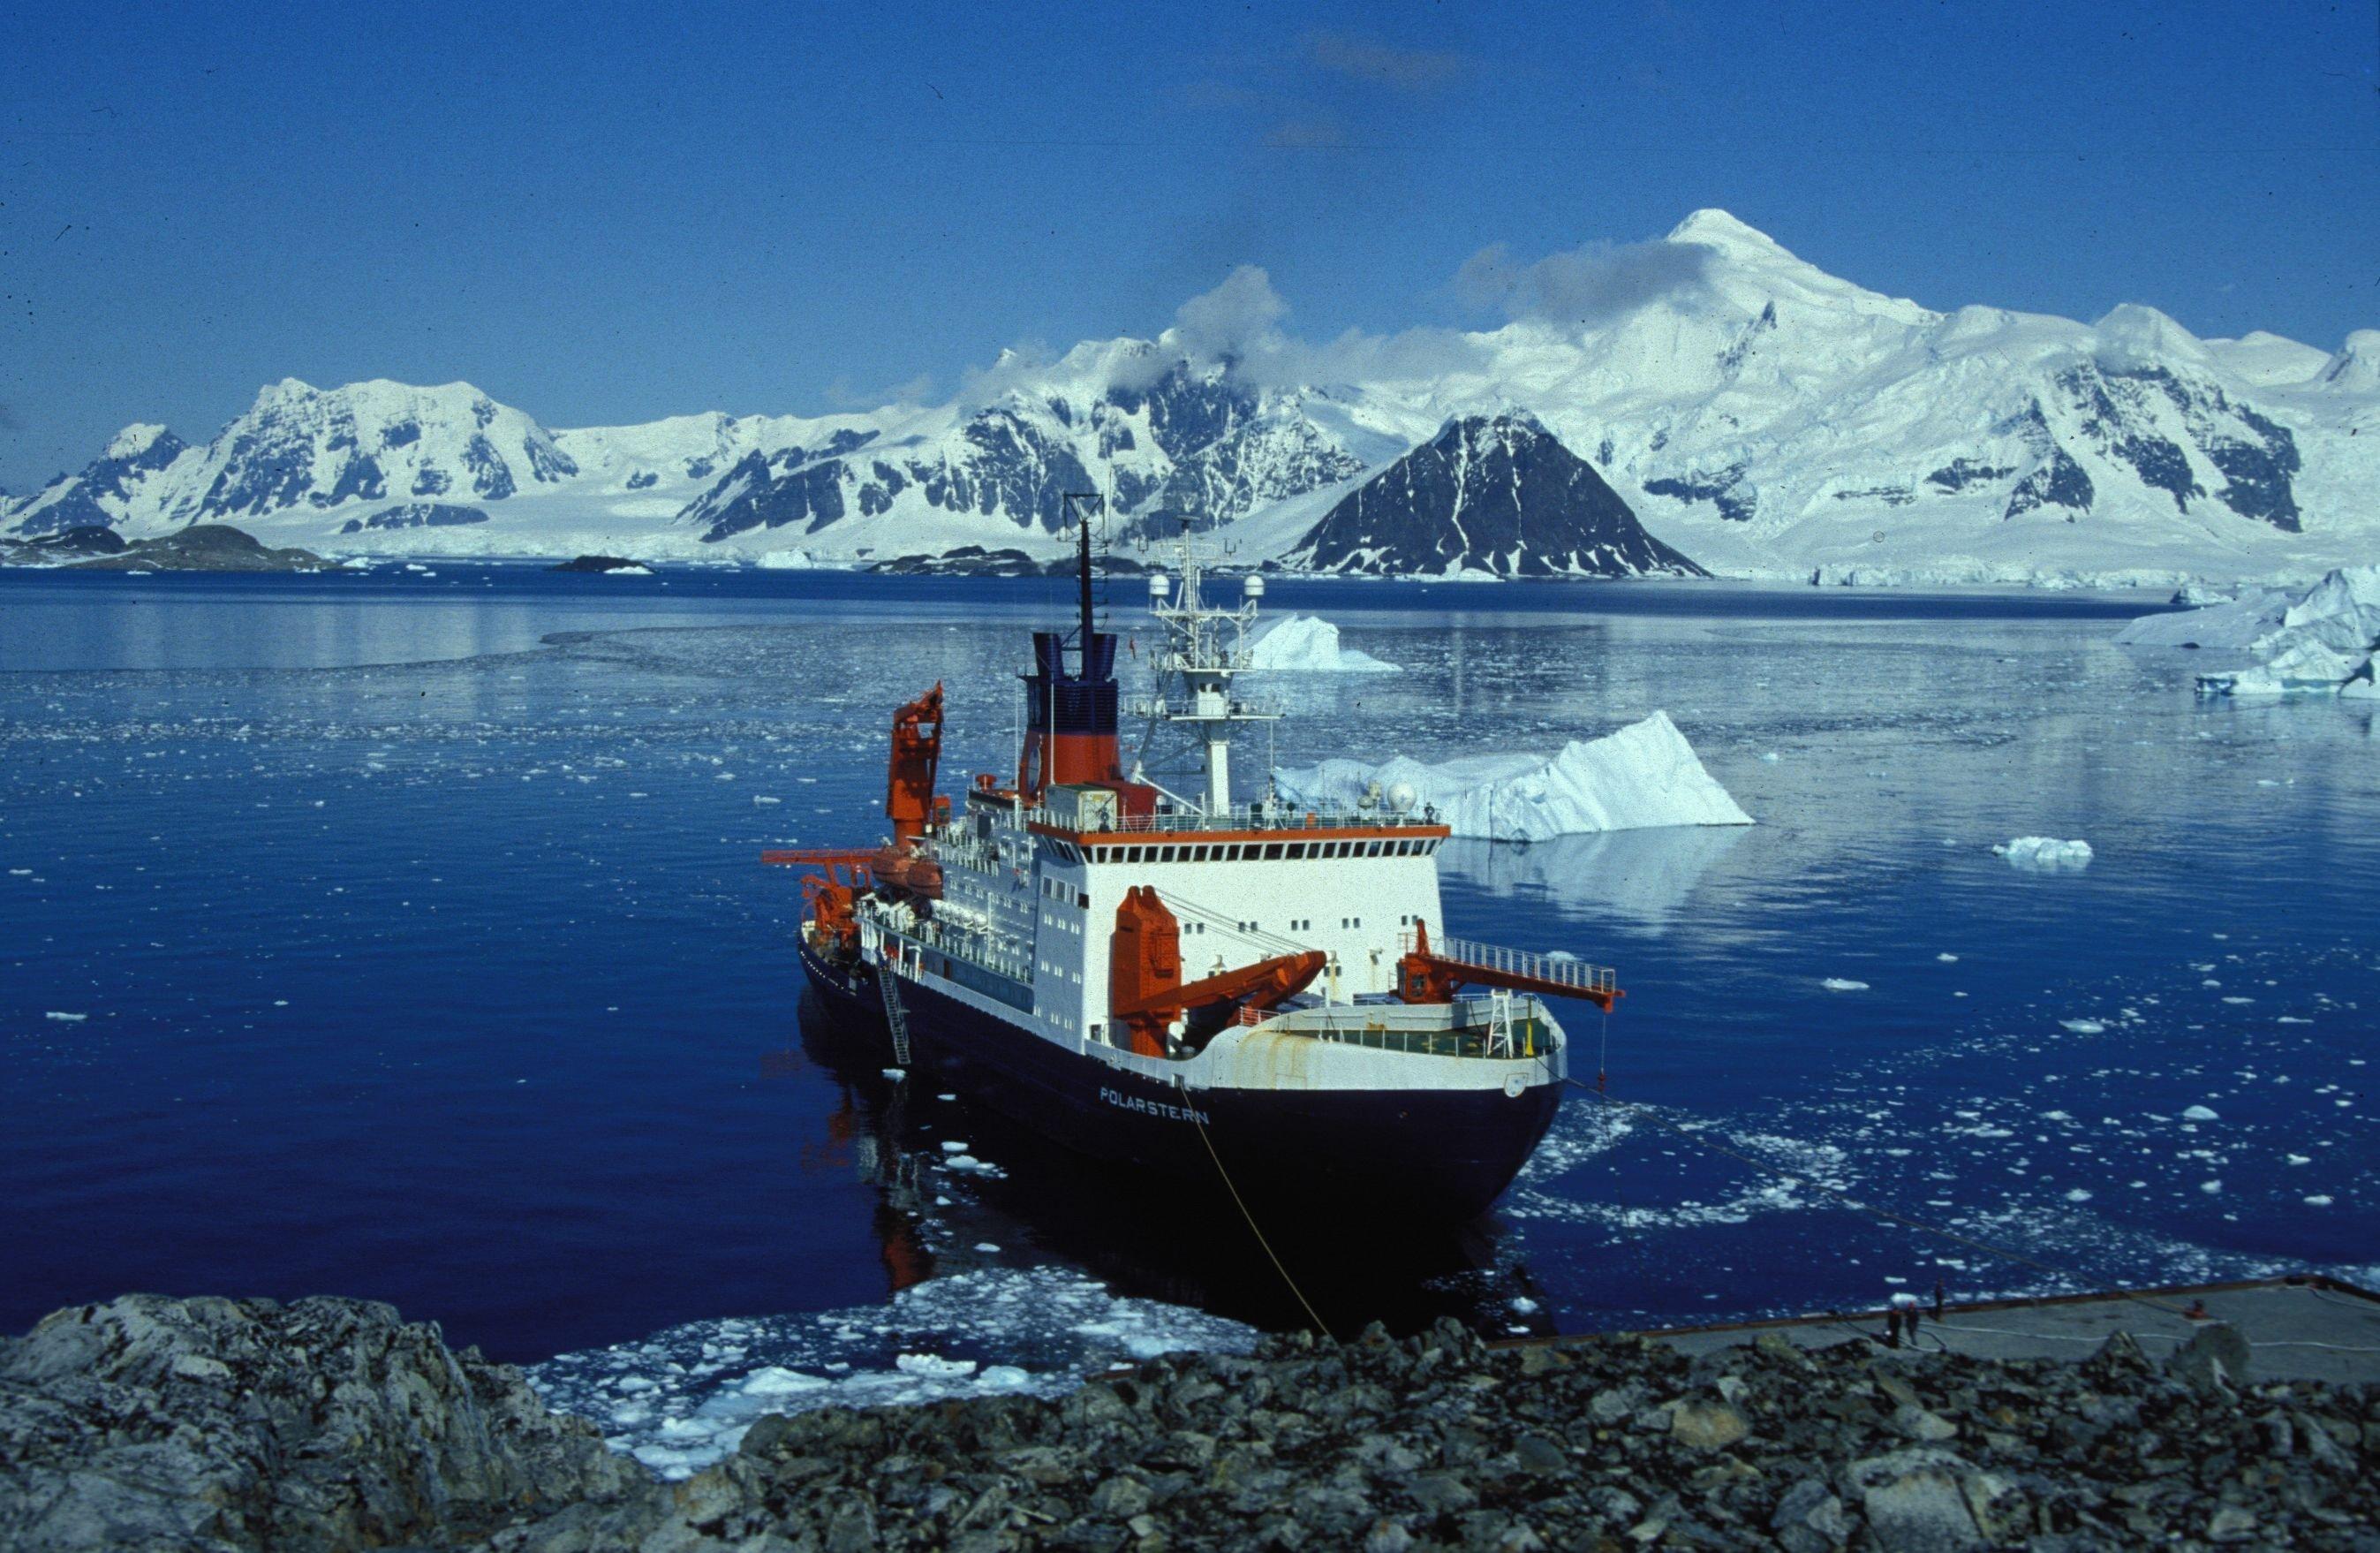 Le navire de recherche allemand Polarstern